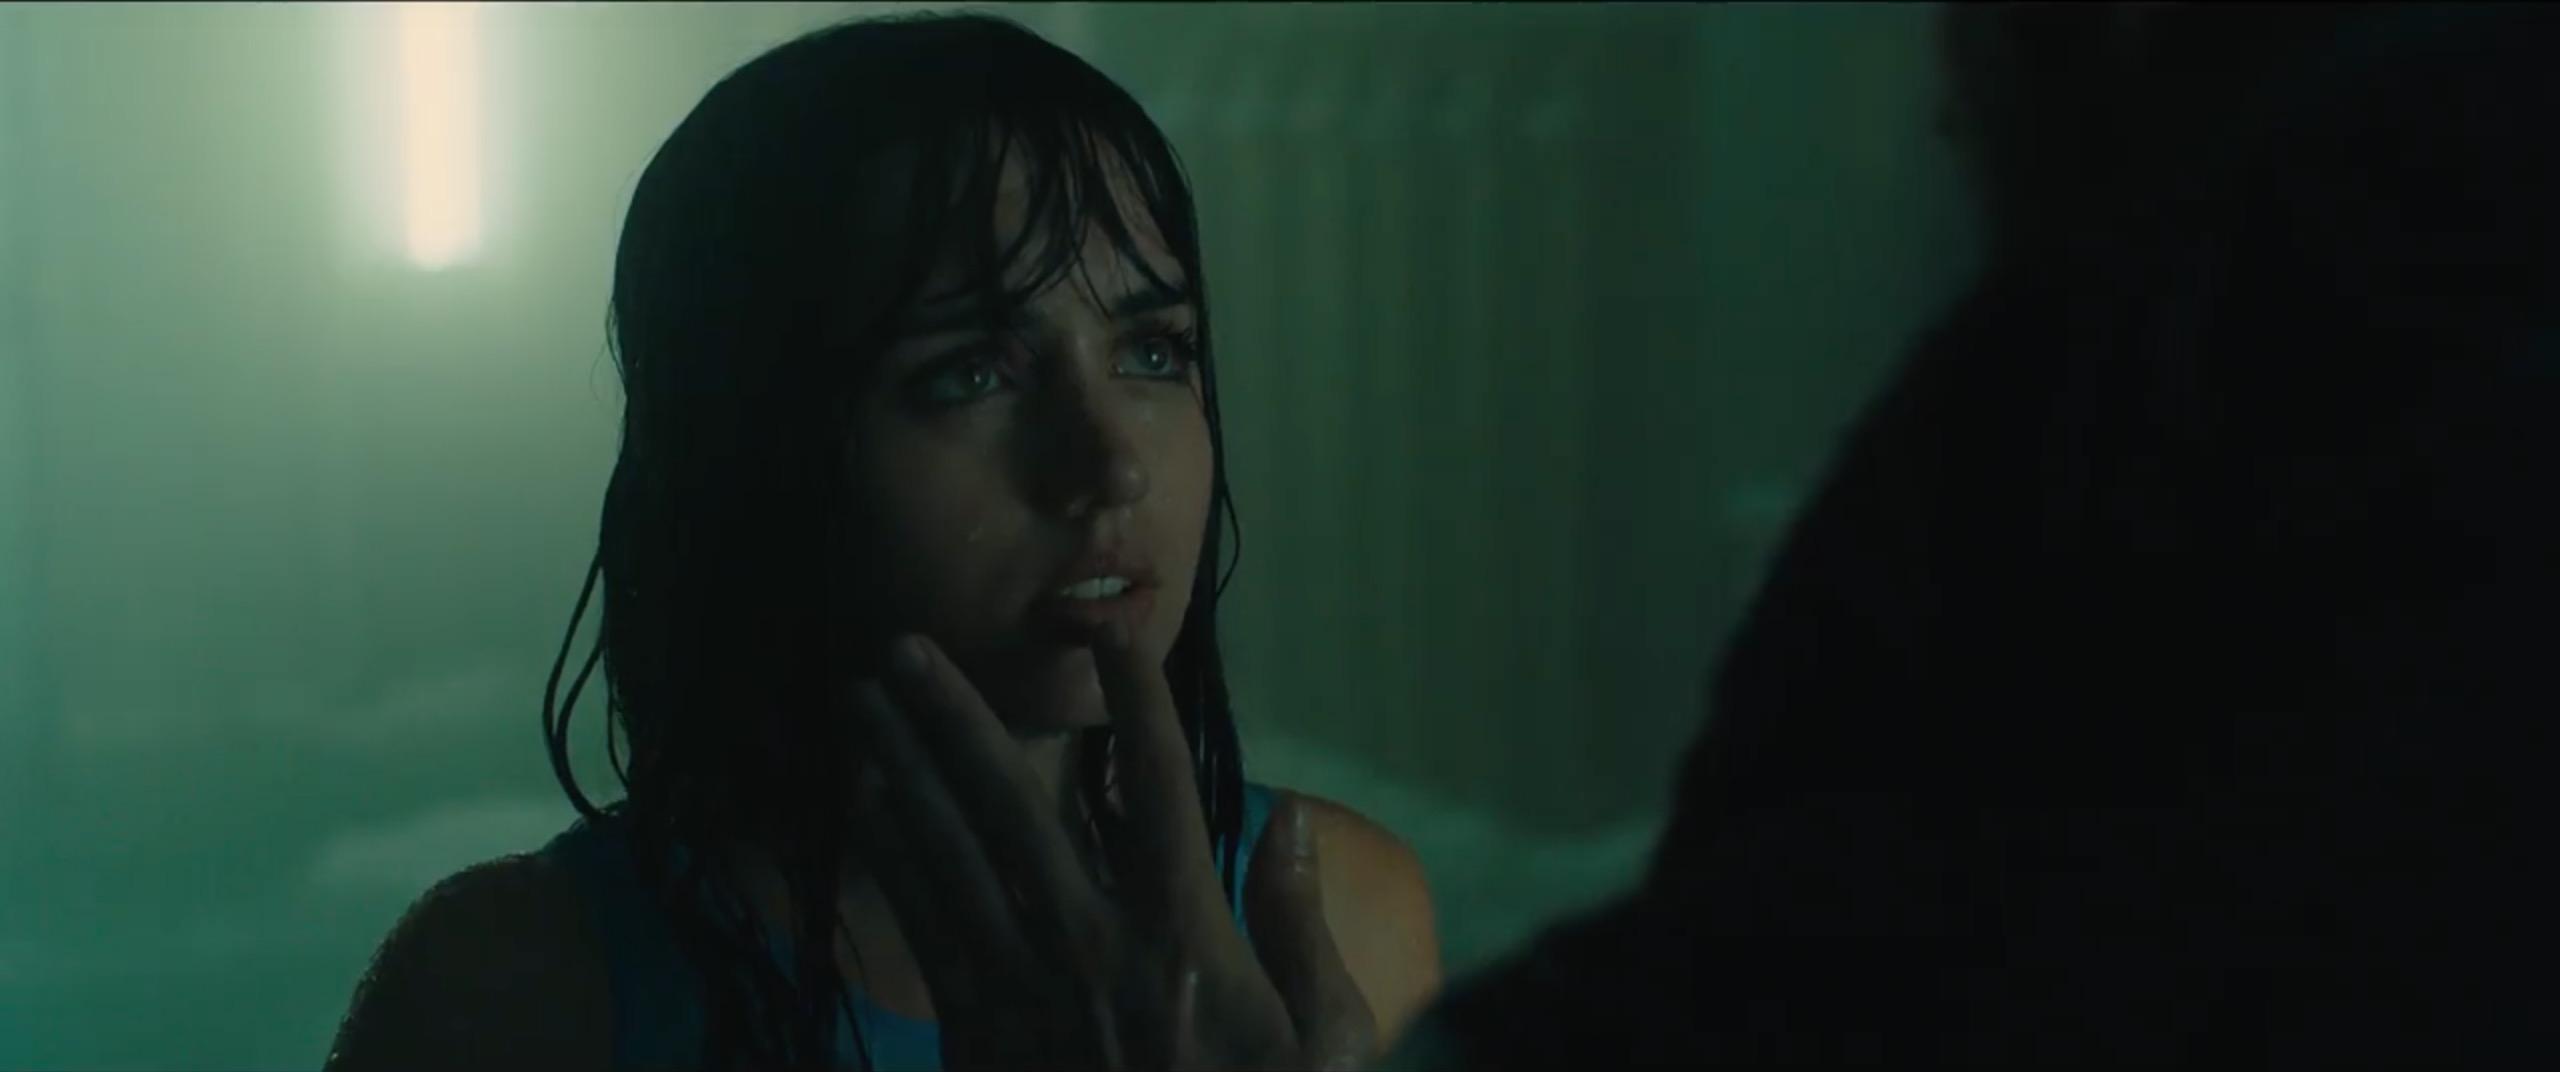 Blade Runner 2049 Trailer Breakdown: What You Missed - photo#16